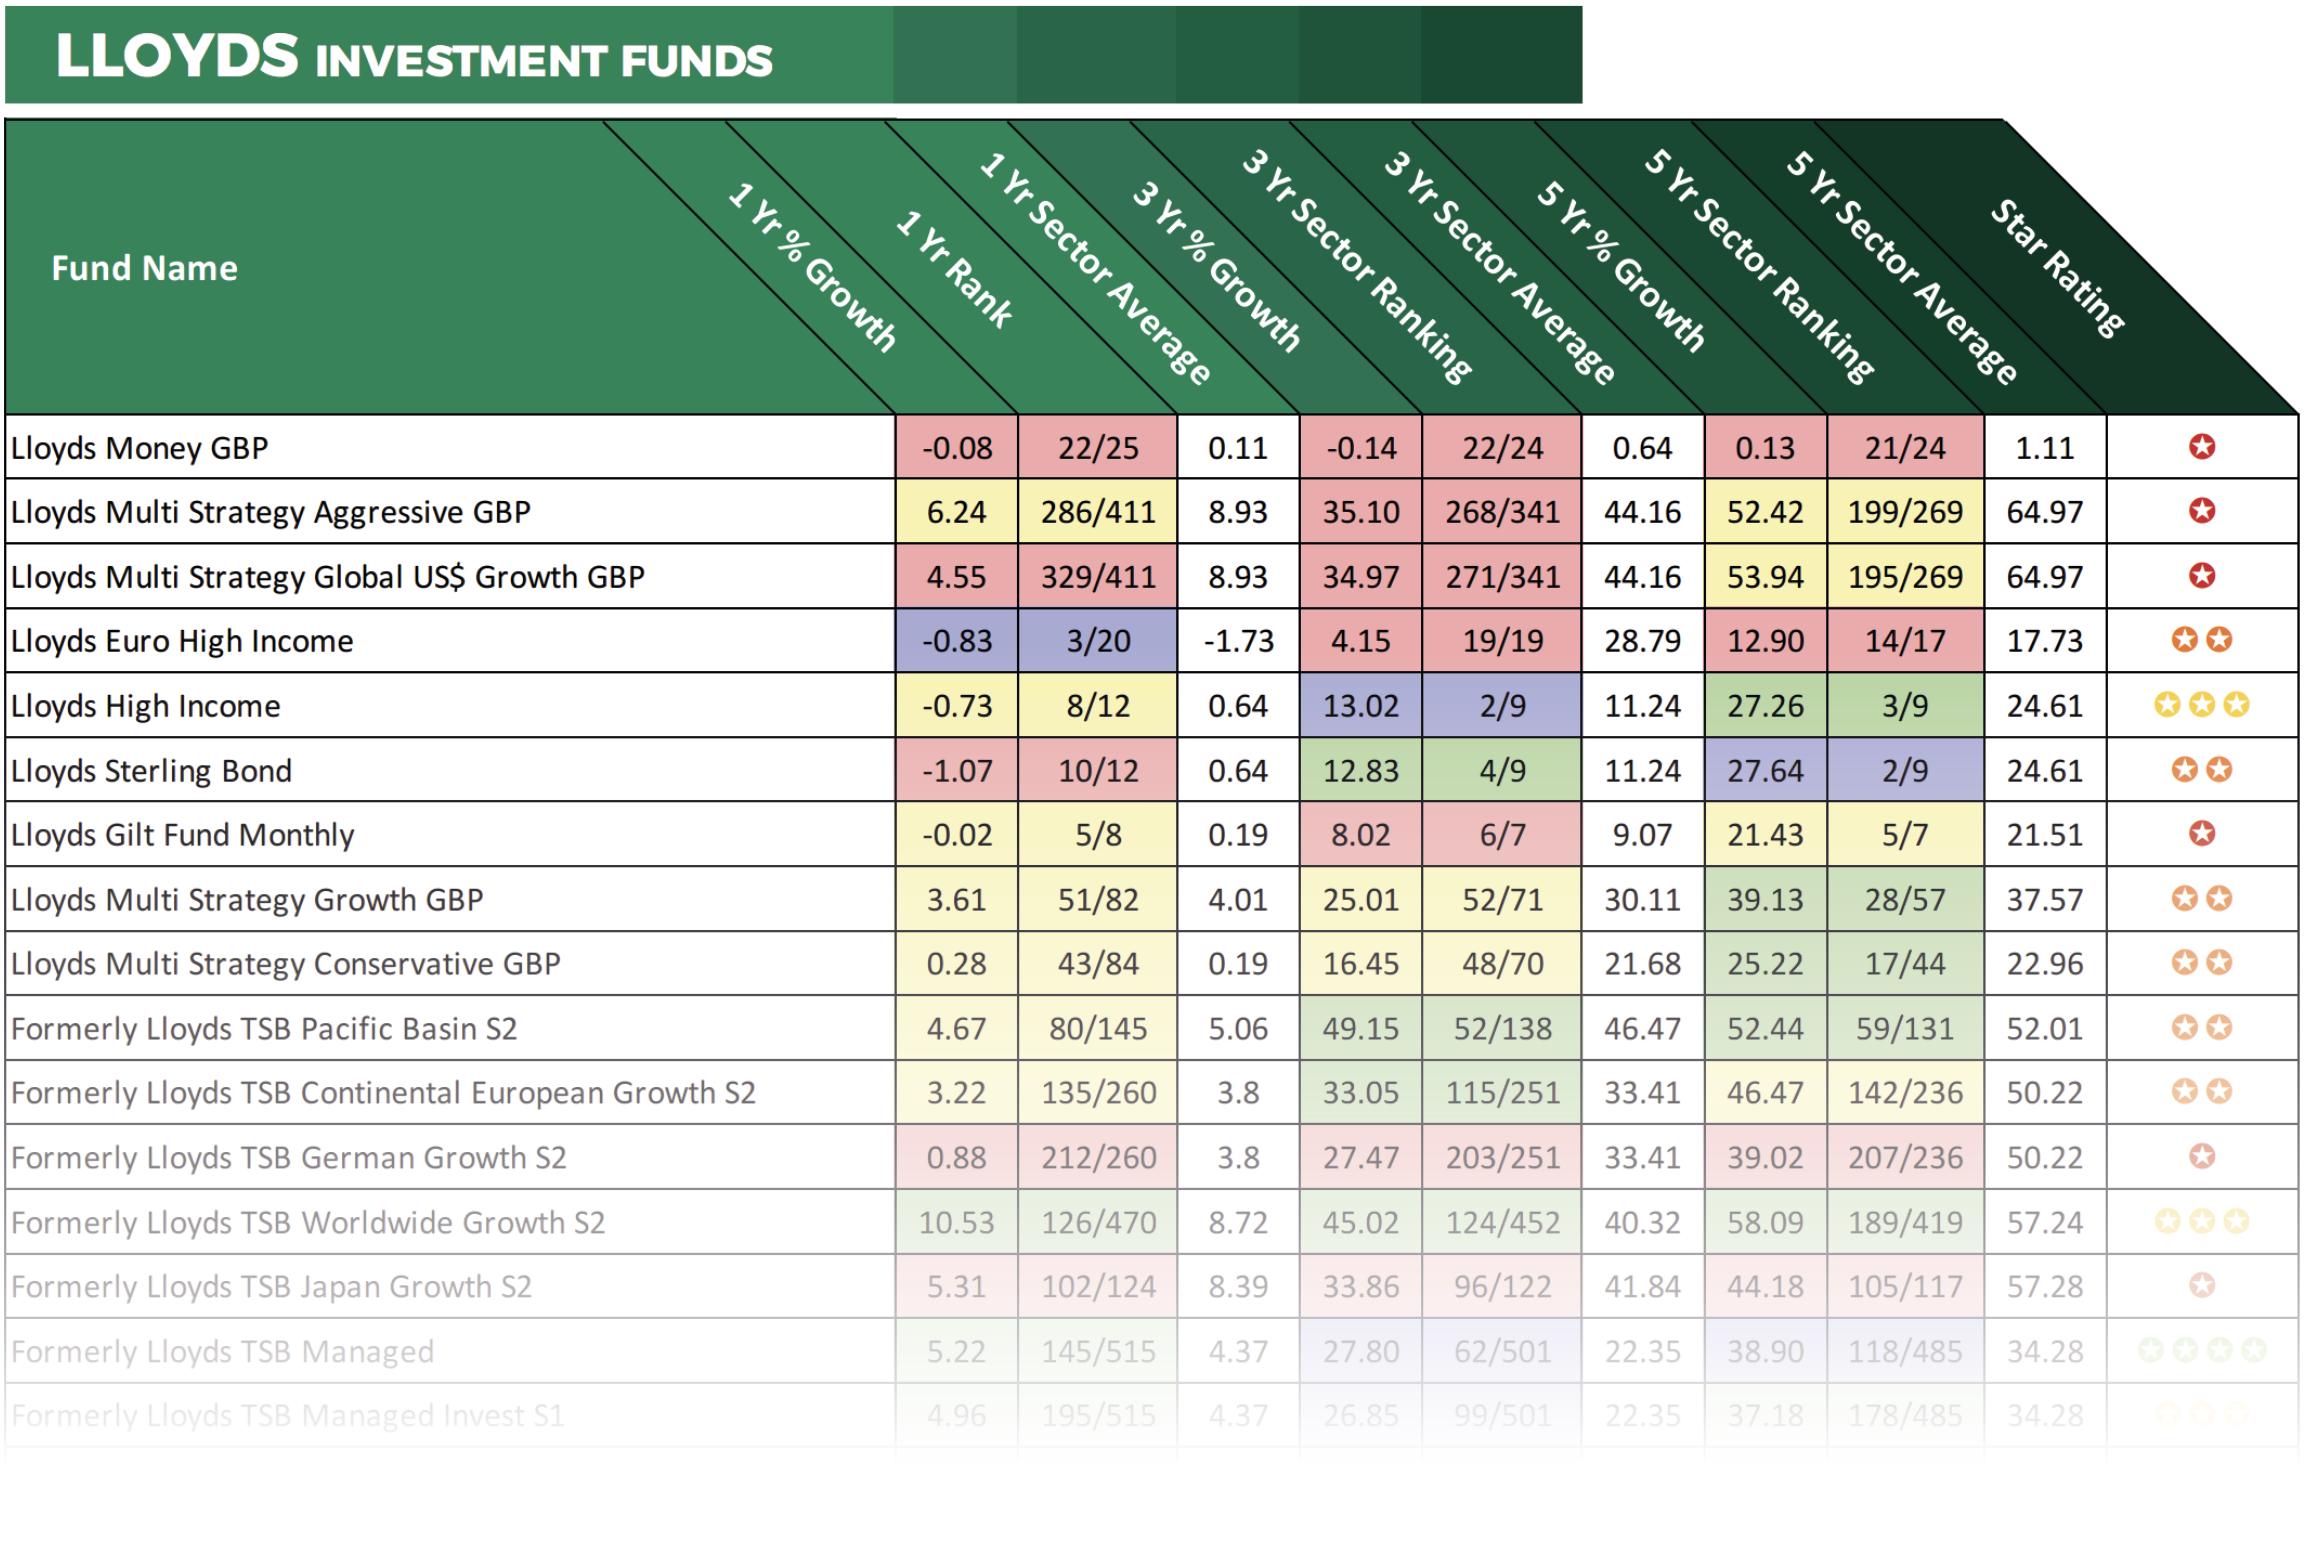 Lloyds fund performance